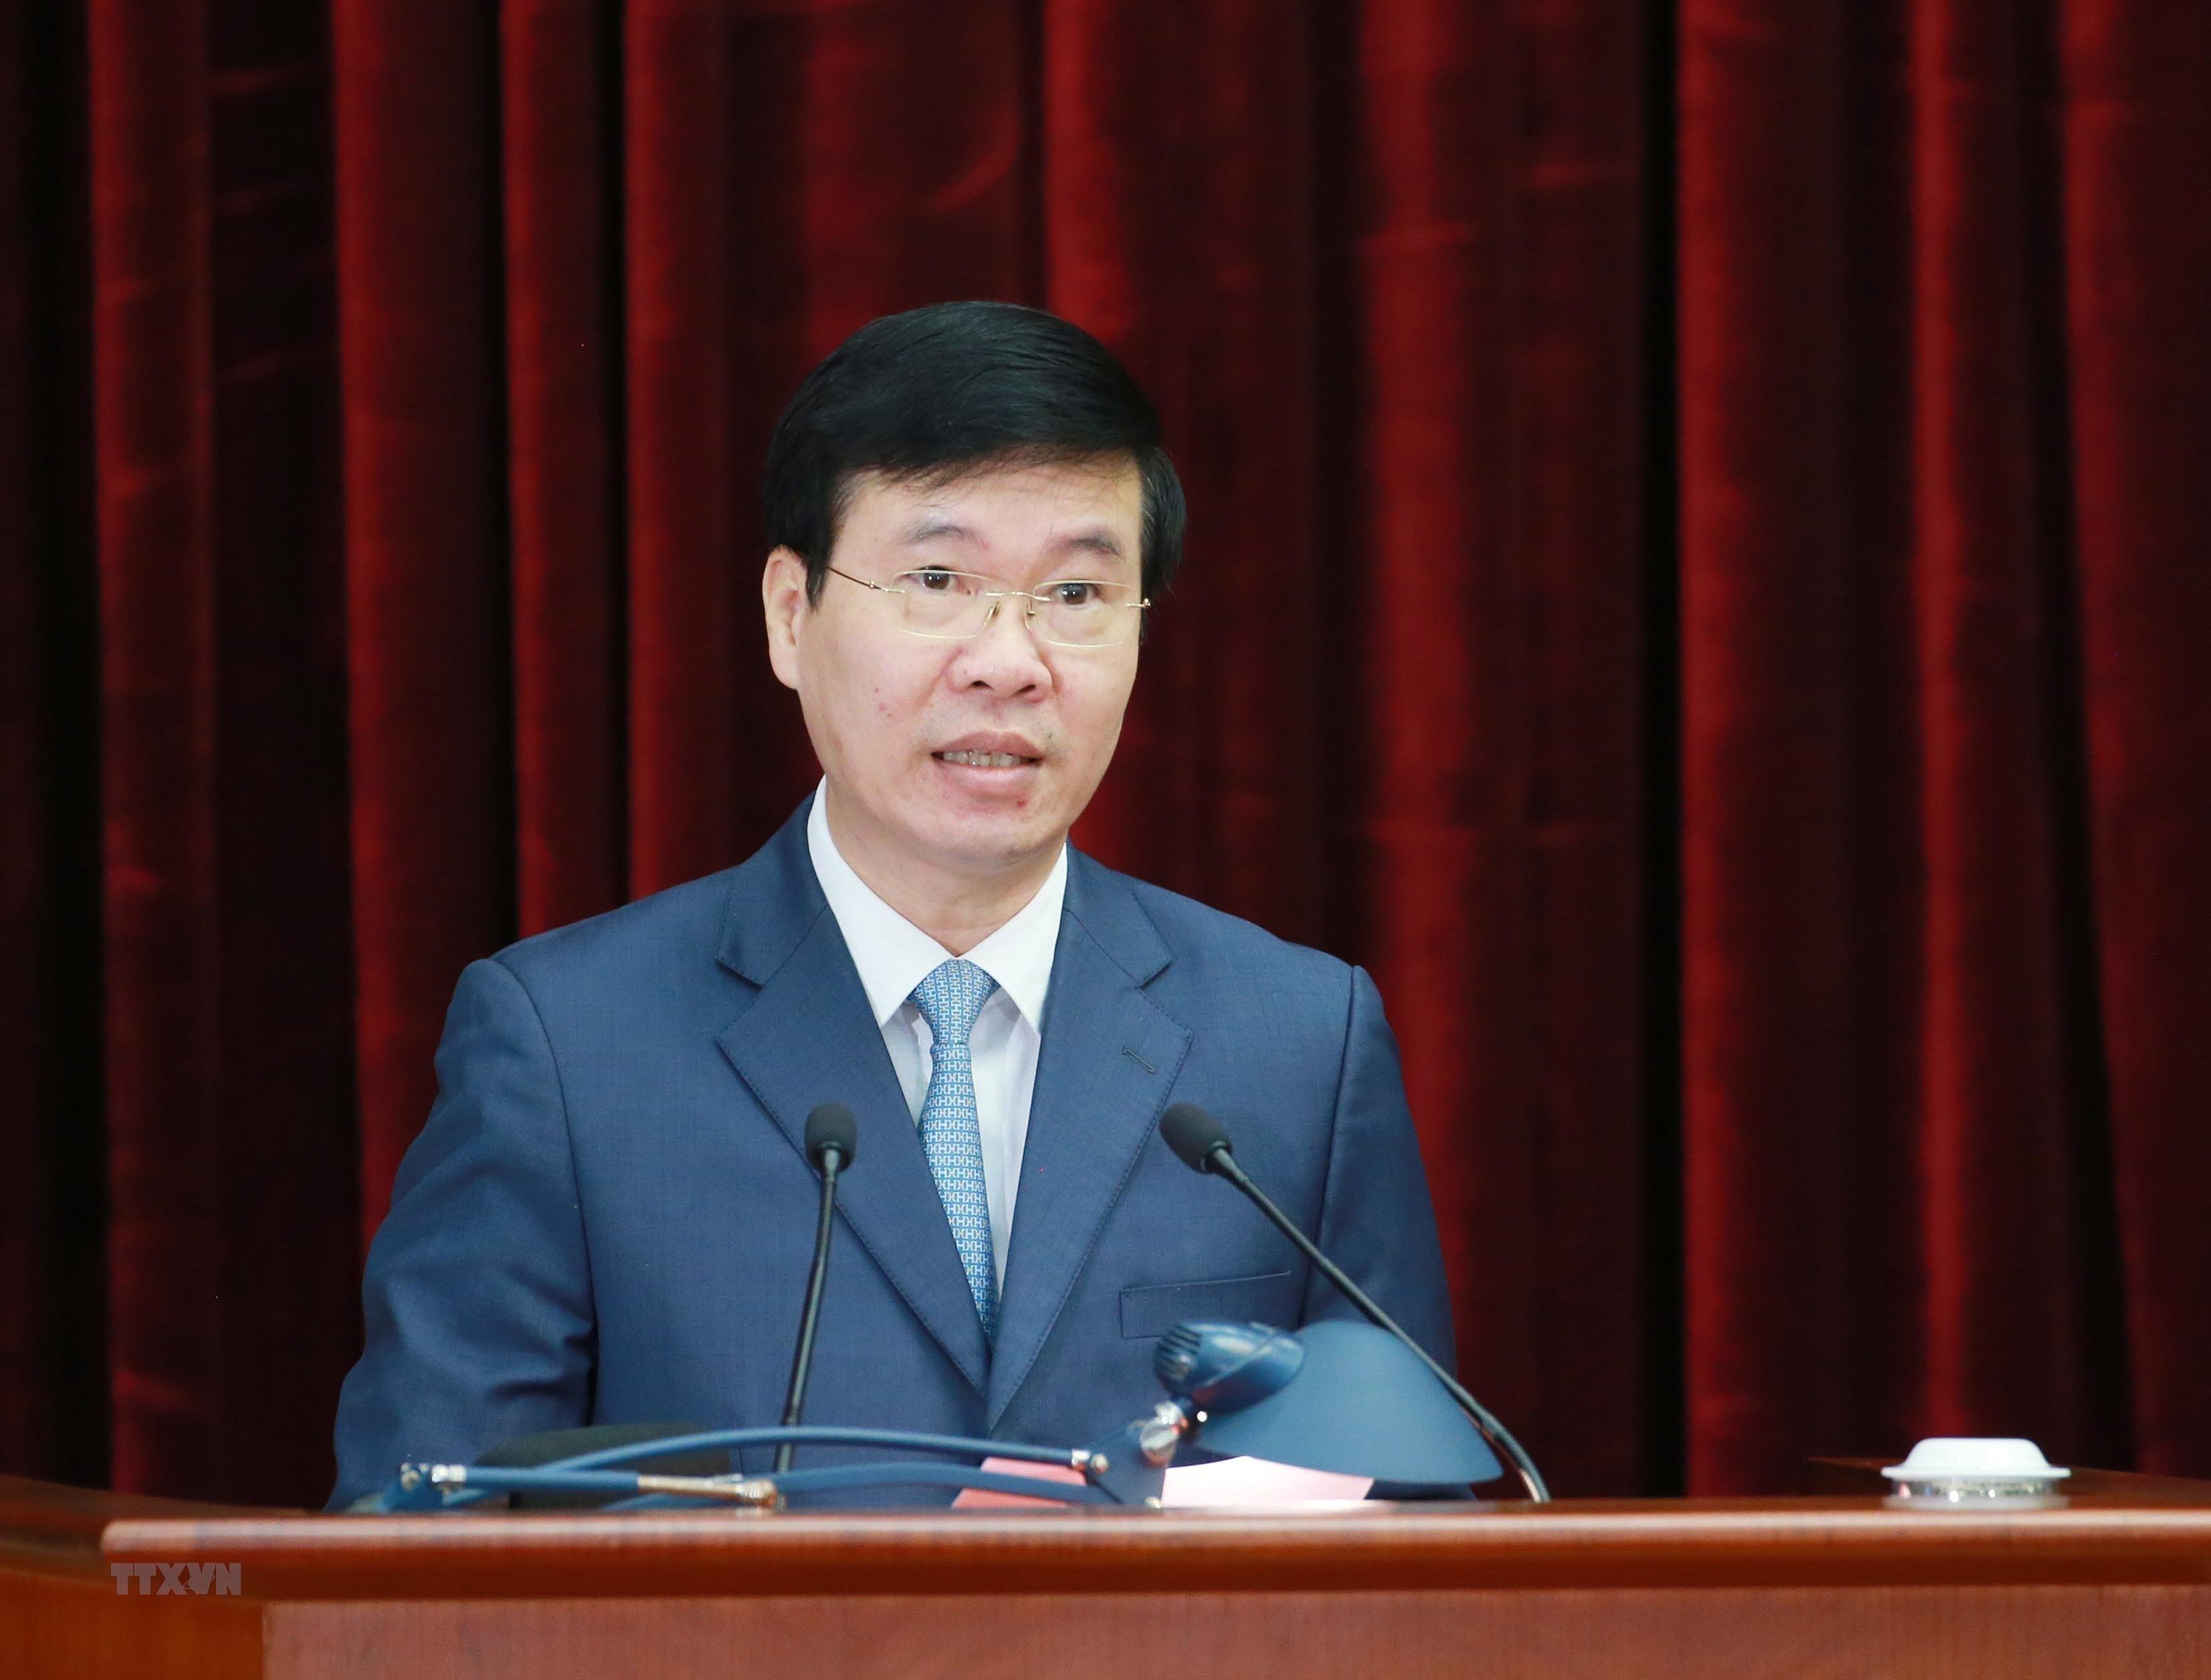 [Photo] Hoi nghi lan thu tu Ban Chap hanh Trung uong Dang khoa XIII hinh anh 13